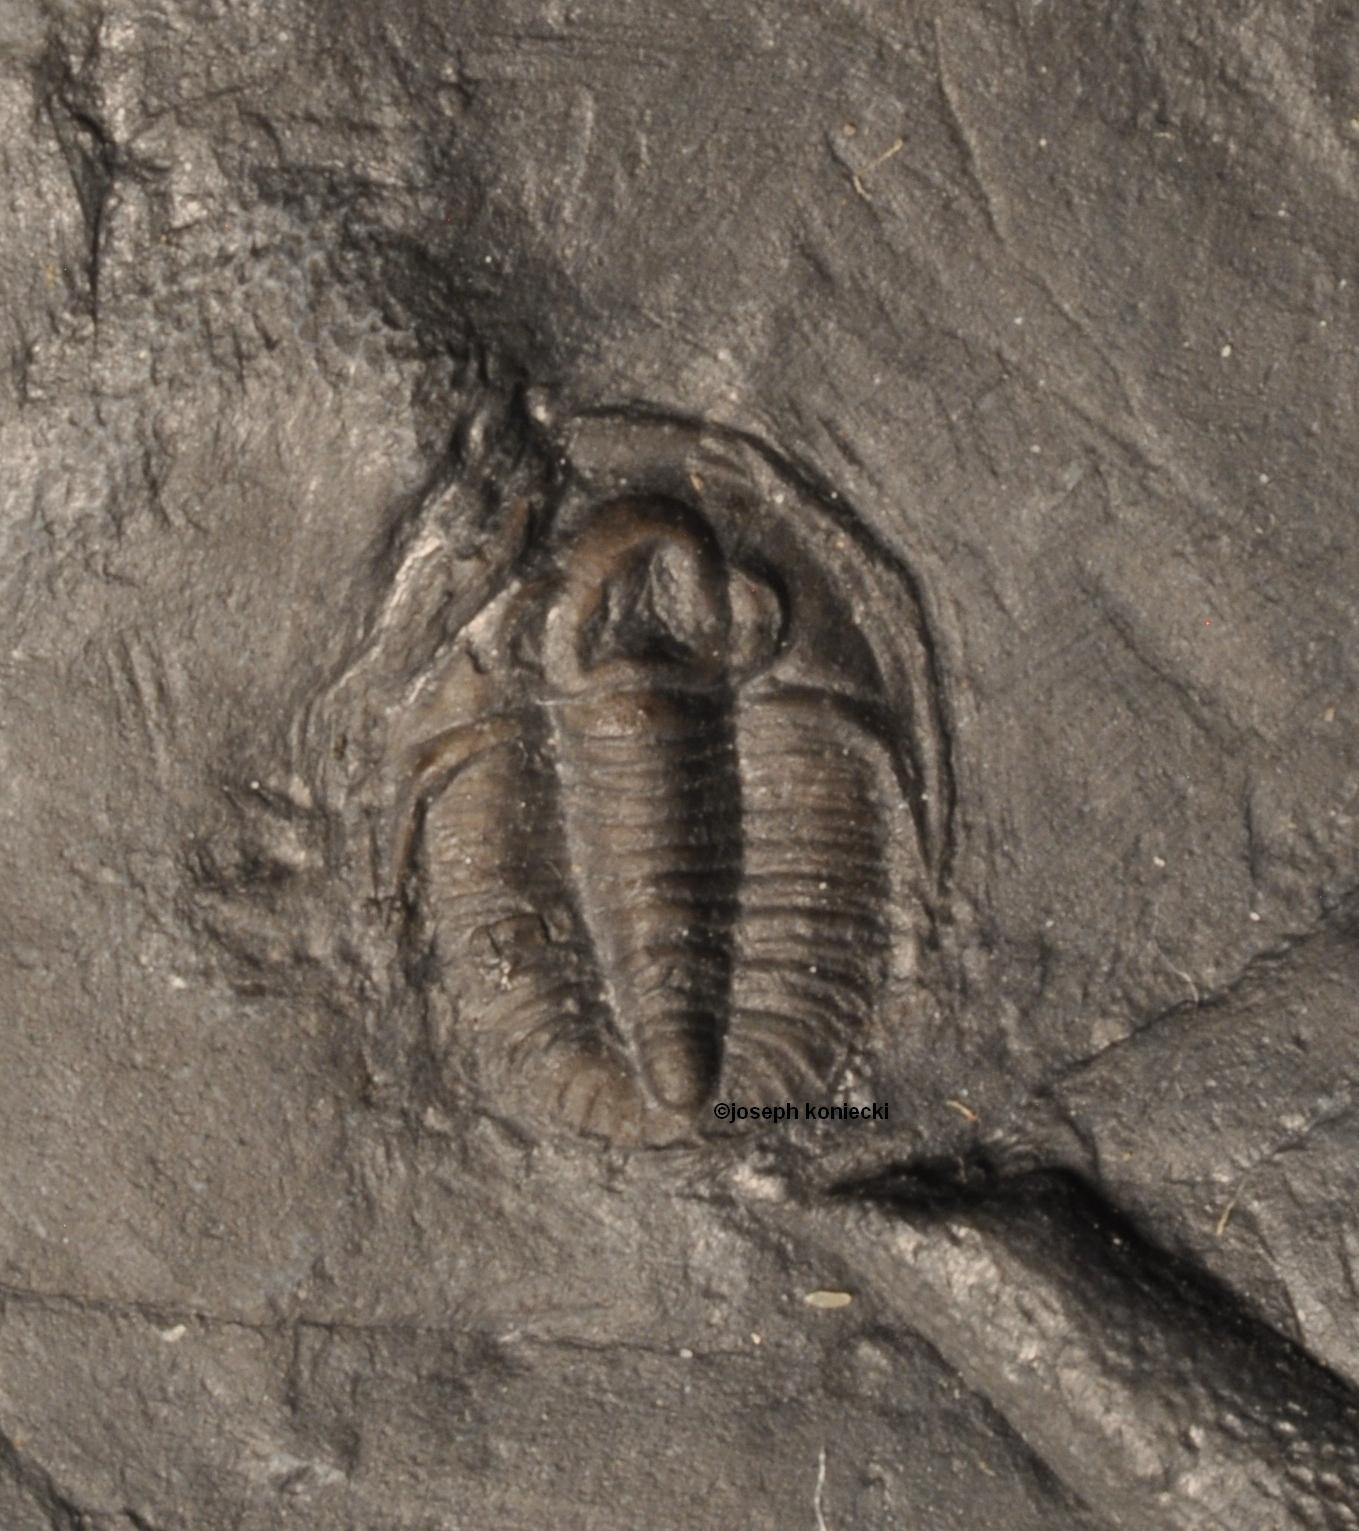 Cyphoproetus